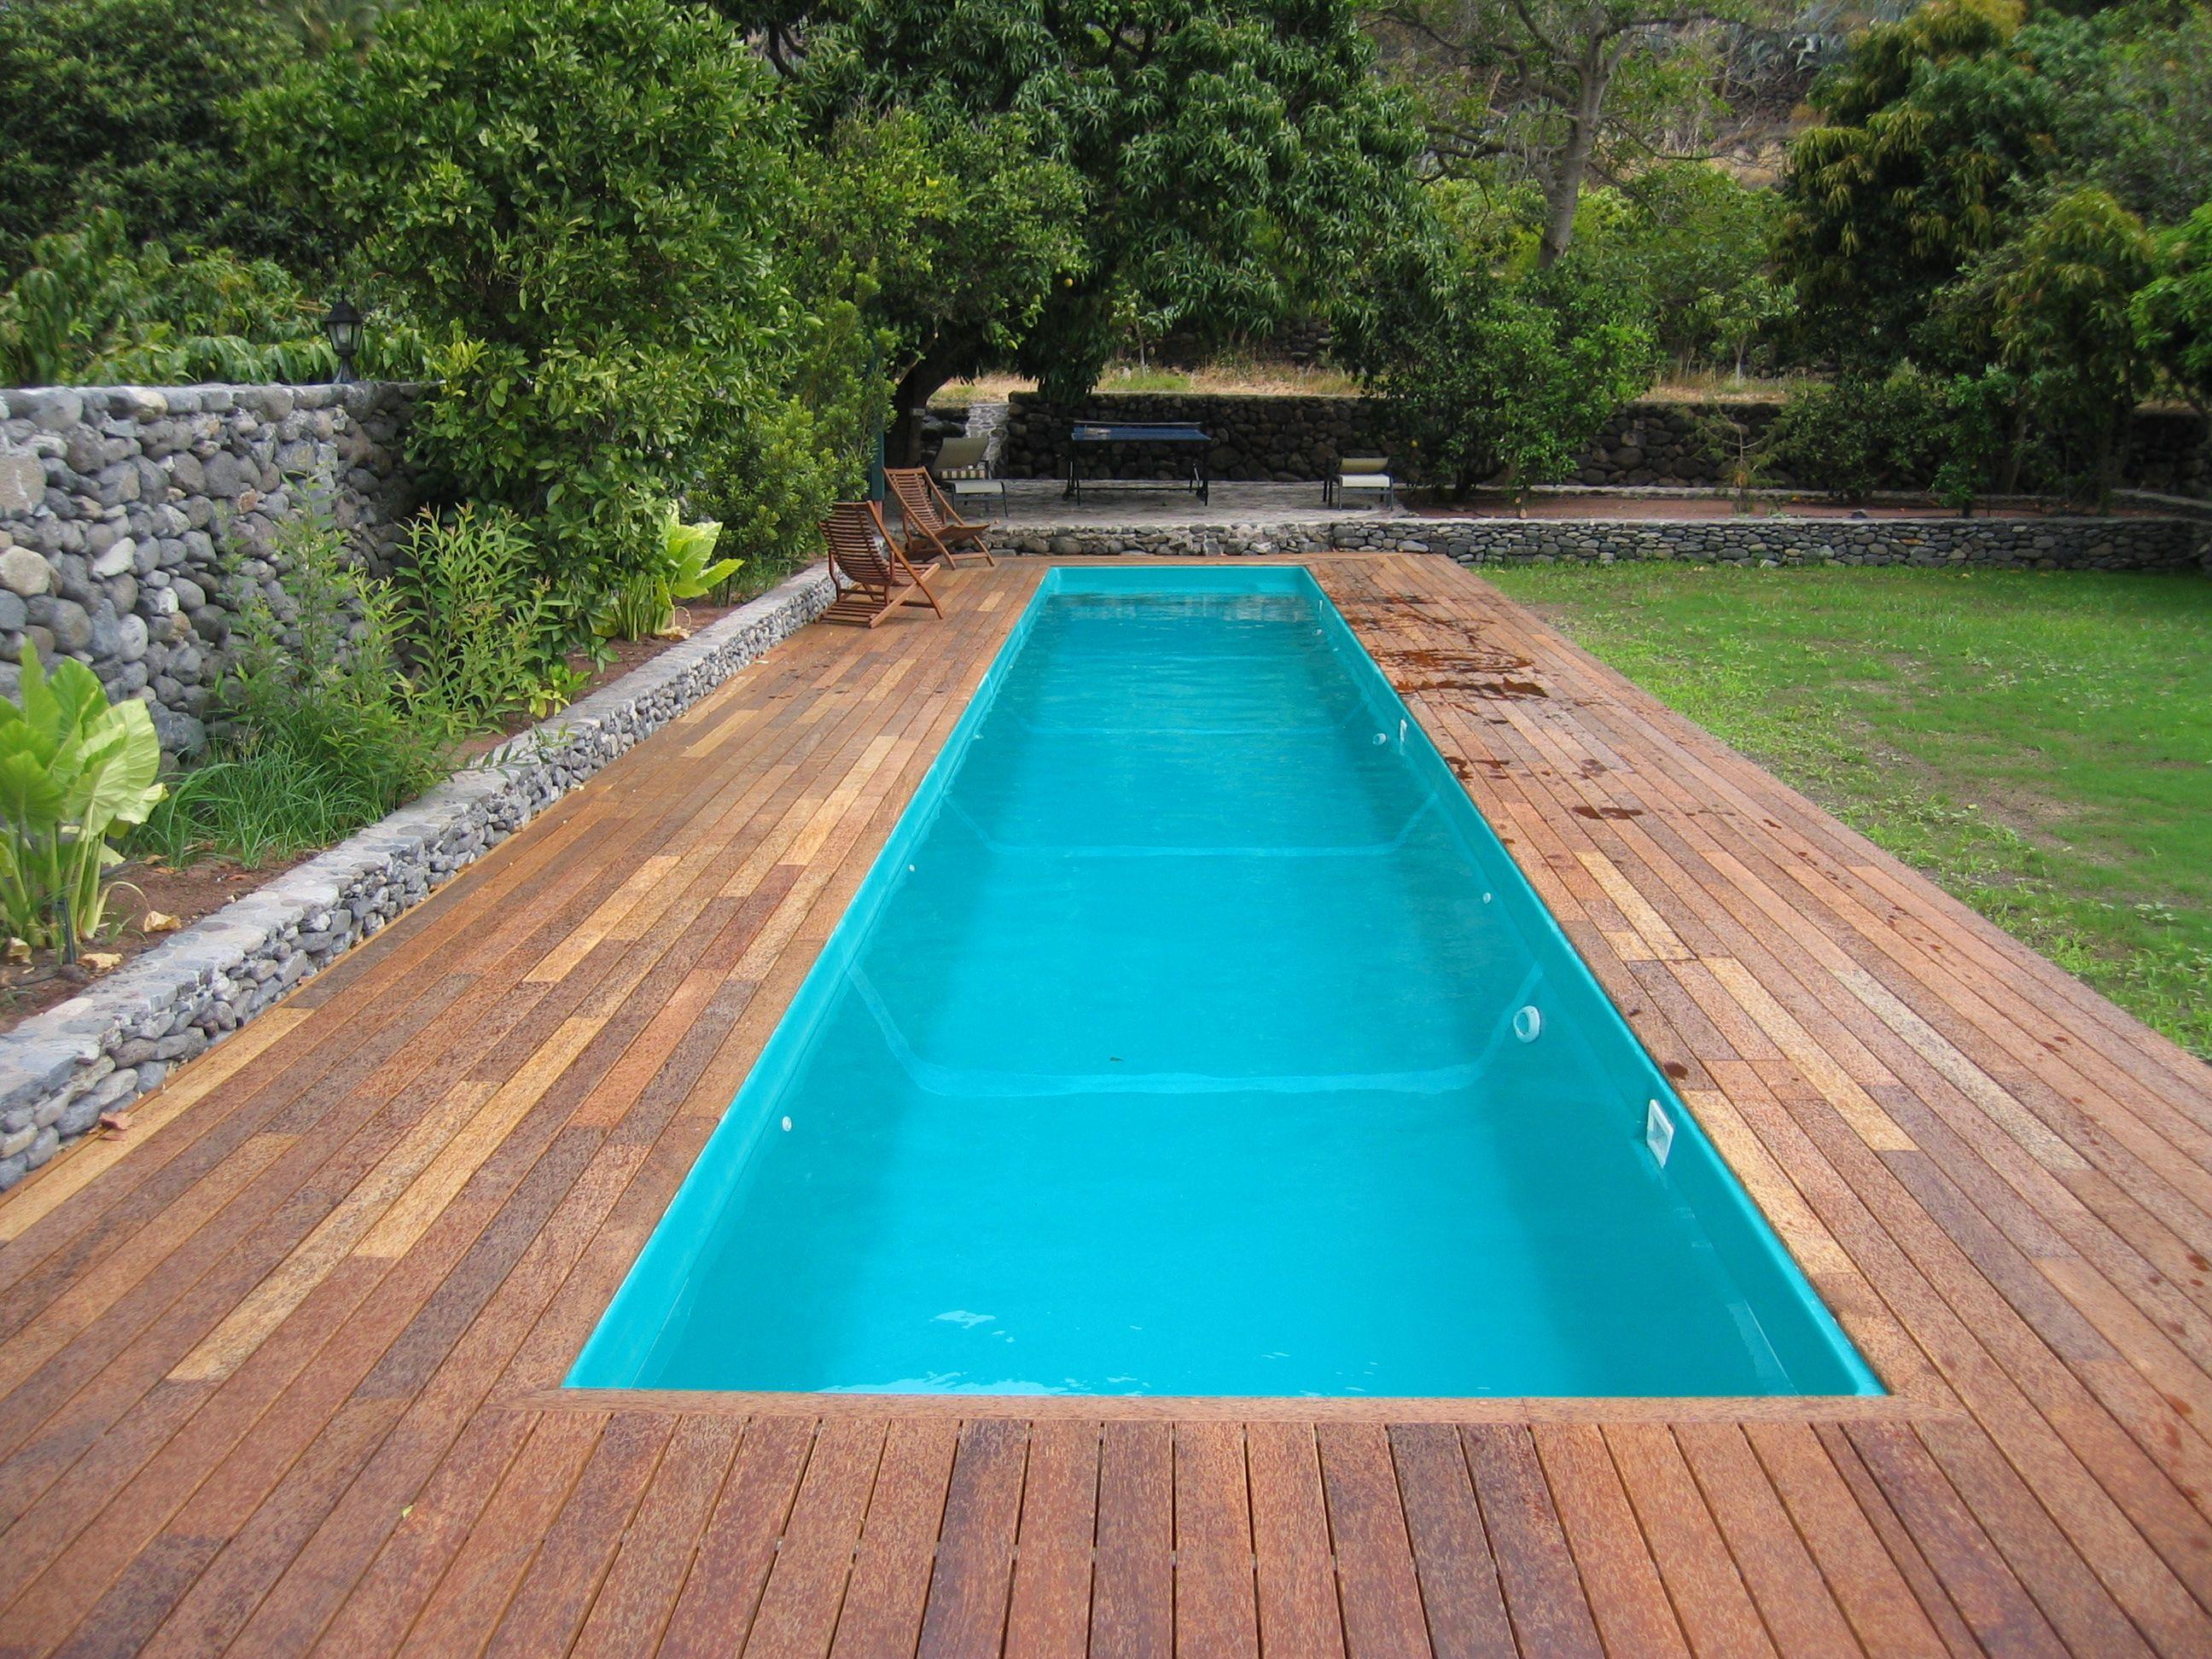 piscina prefabricada de madera  Piscinas de ltima hora